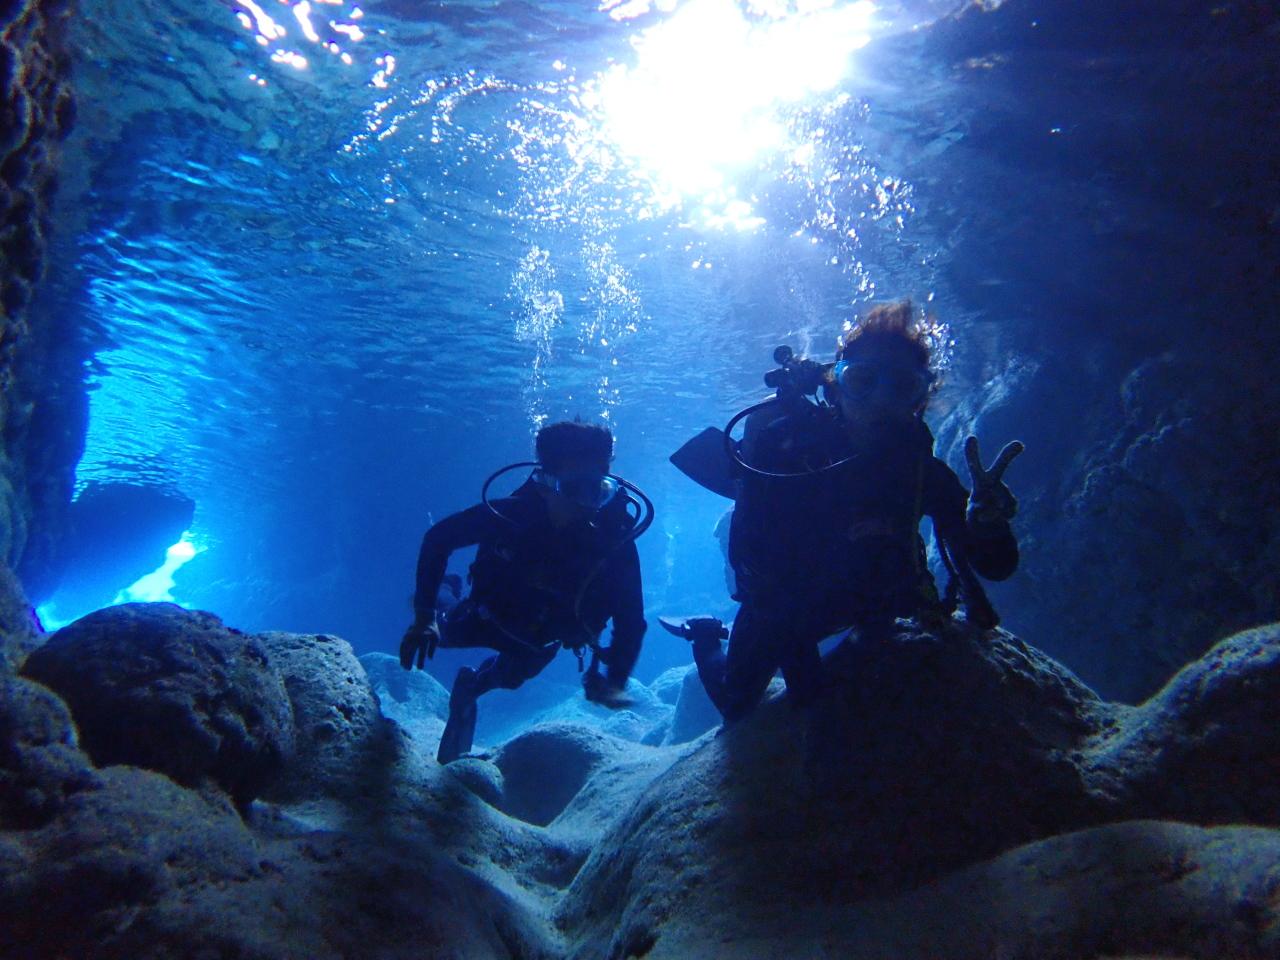 kailaの伊良部島ダイビングは完全貸し切り!メリットたくさん!